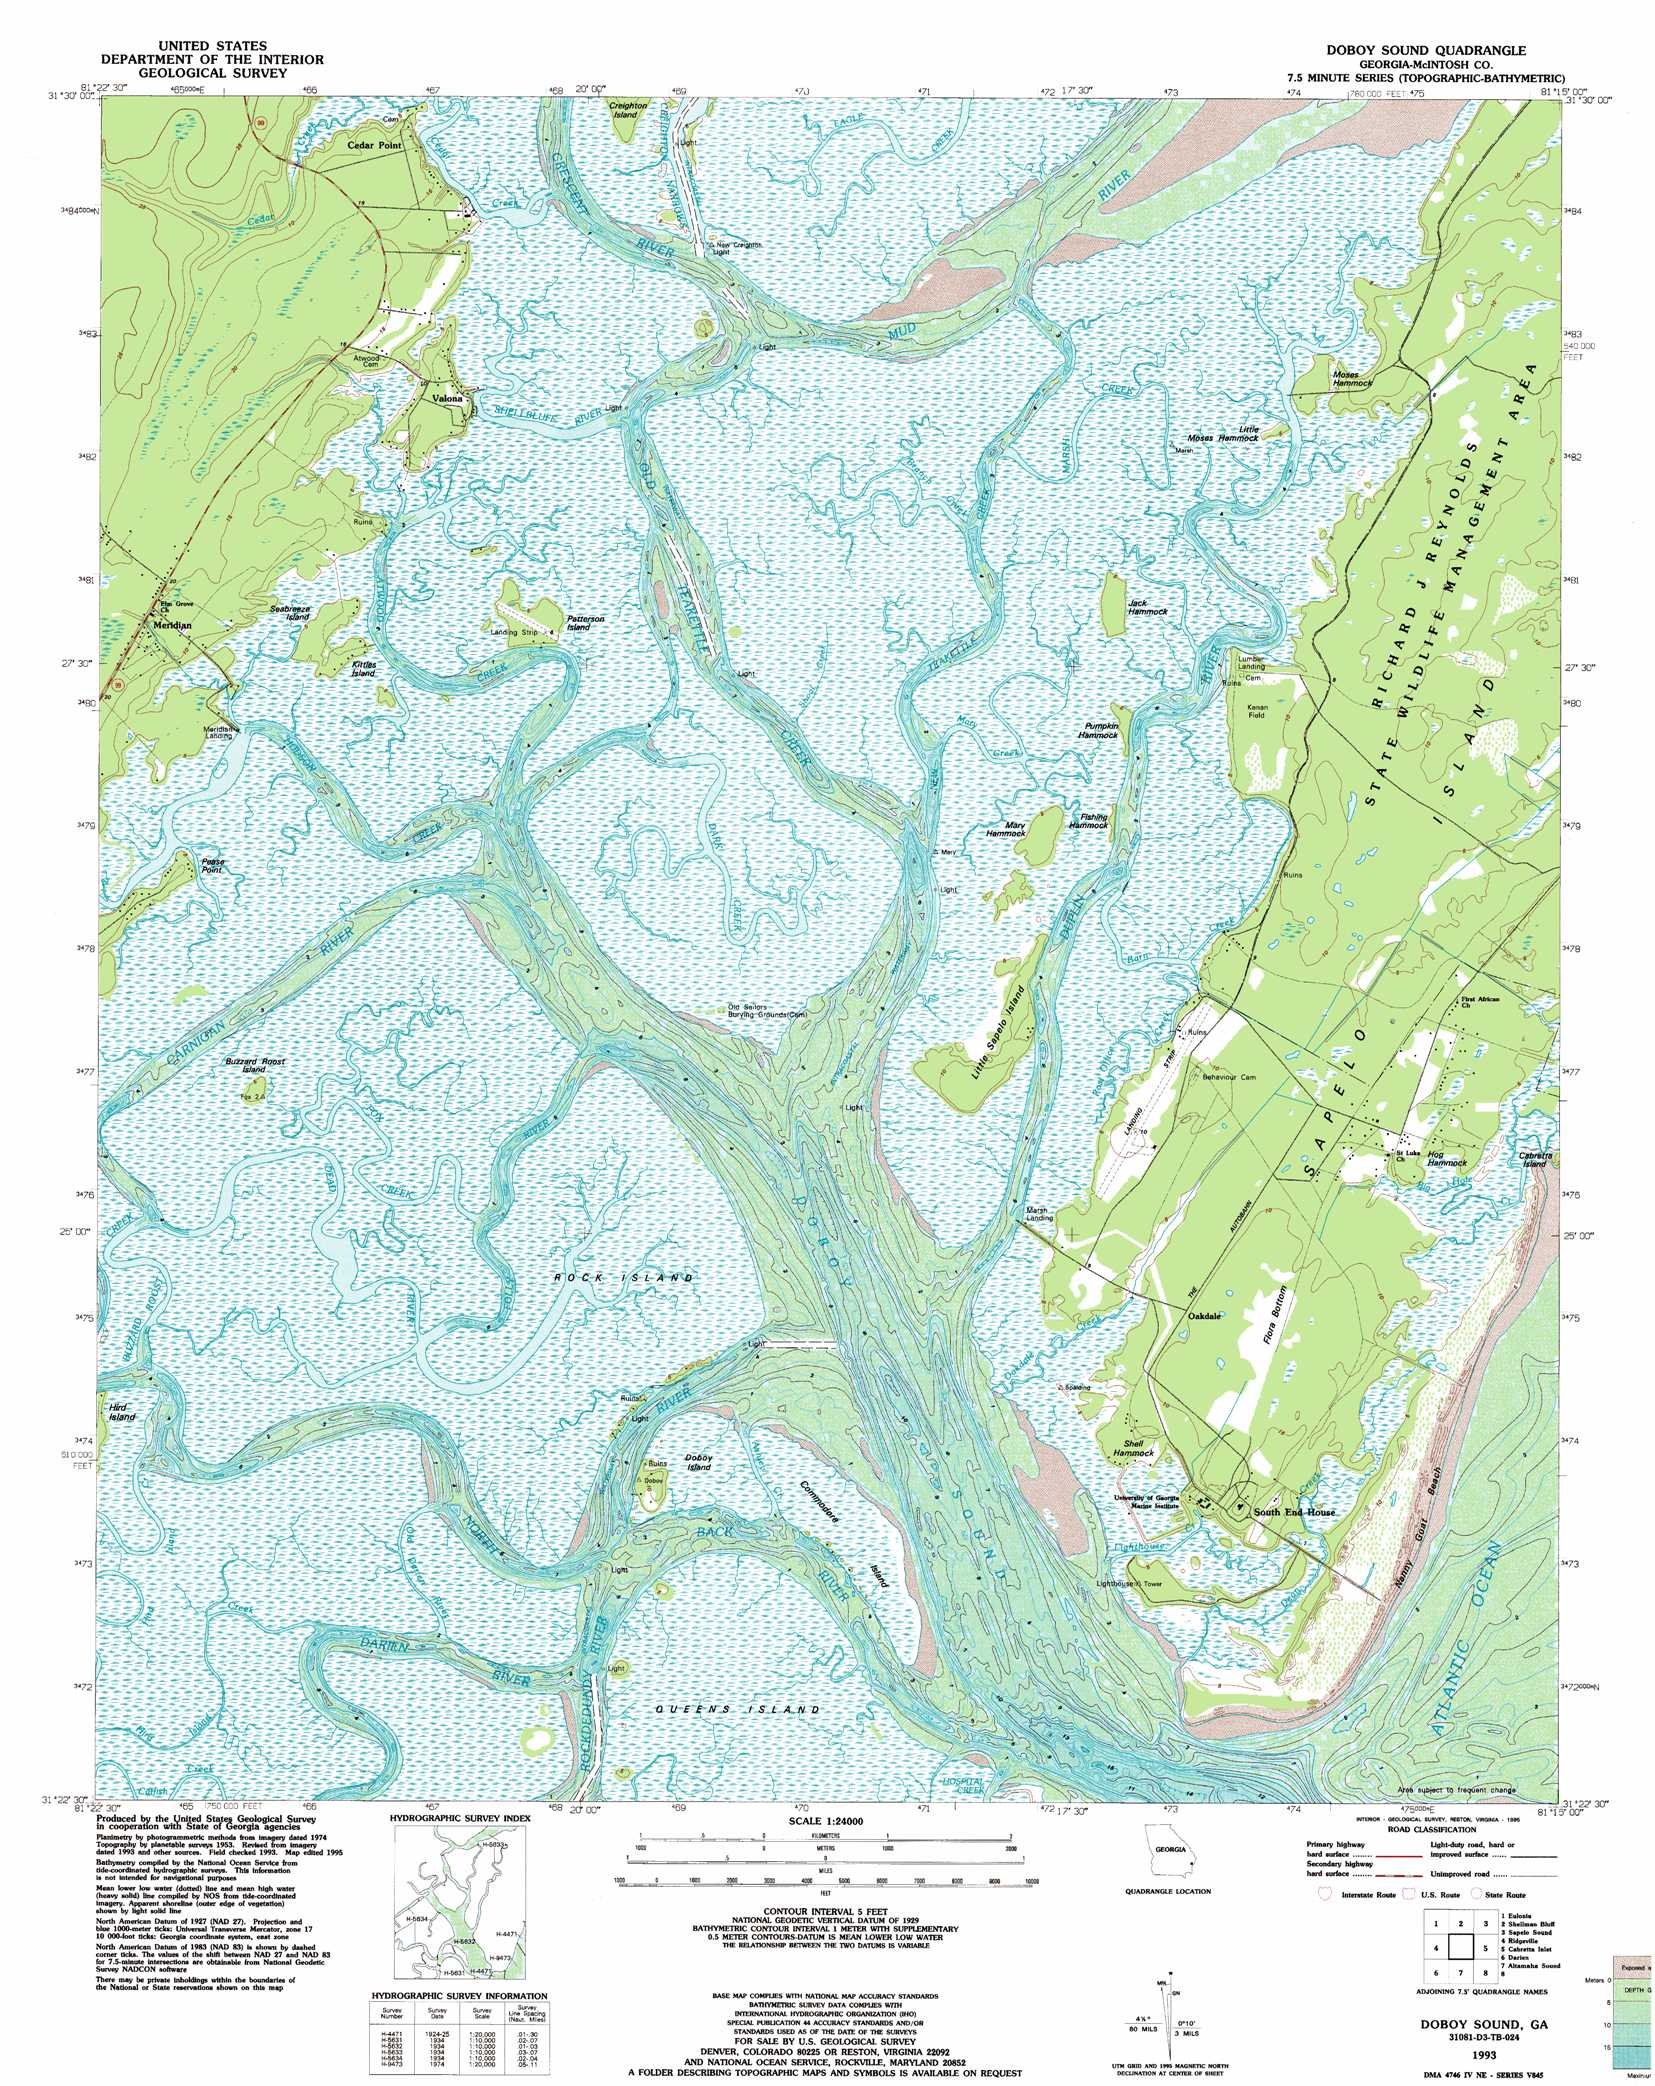 Doboy Sound Topographic Map GA USGS Topo Quad D - Georgia topographic map